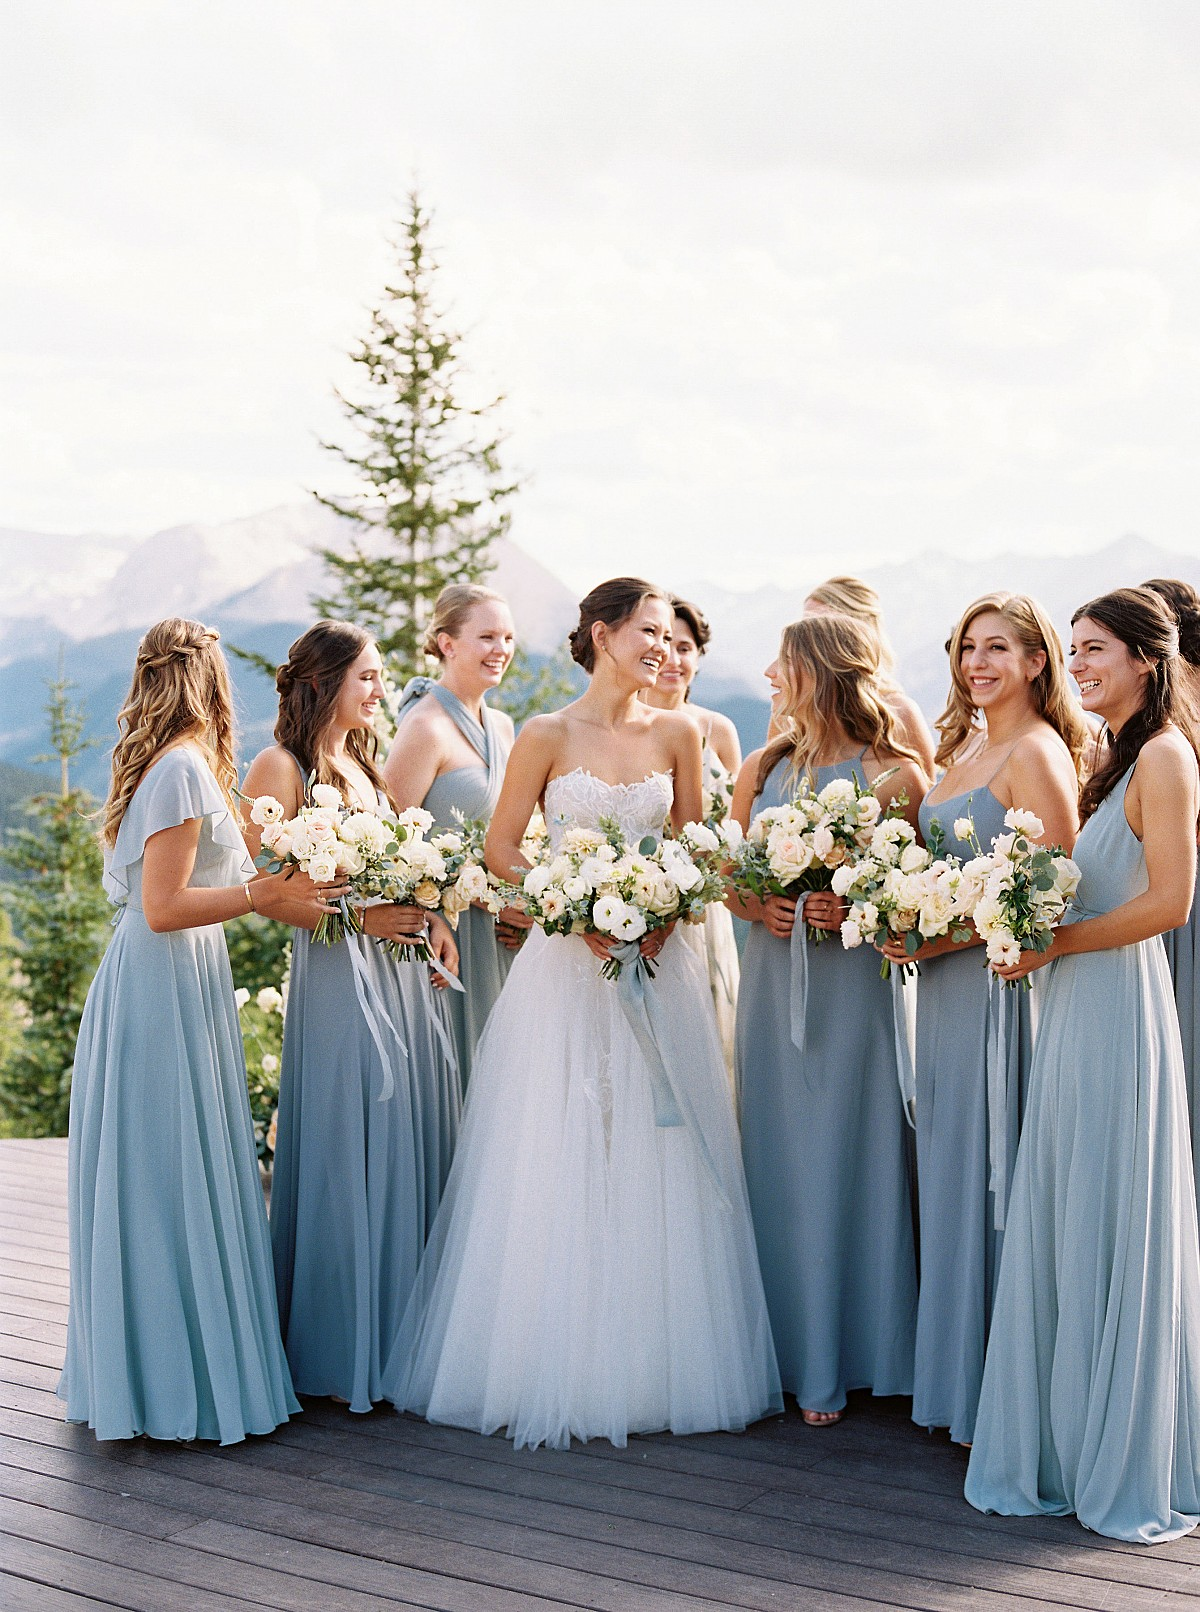 steel blue bridesmaids dresses